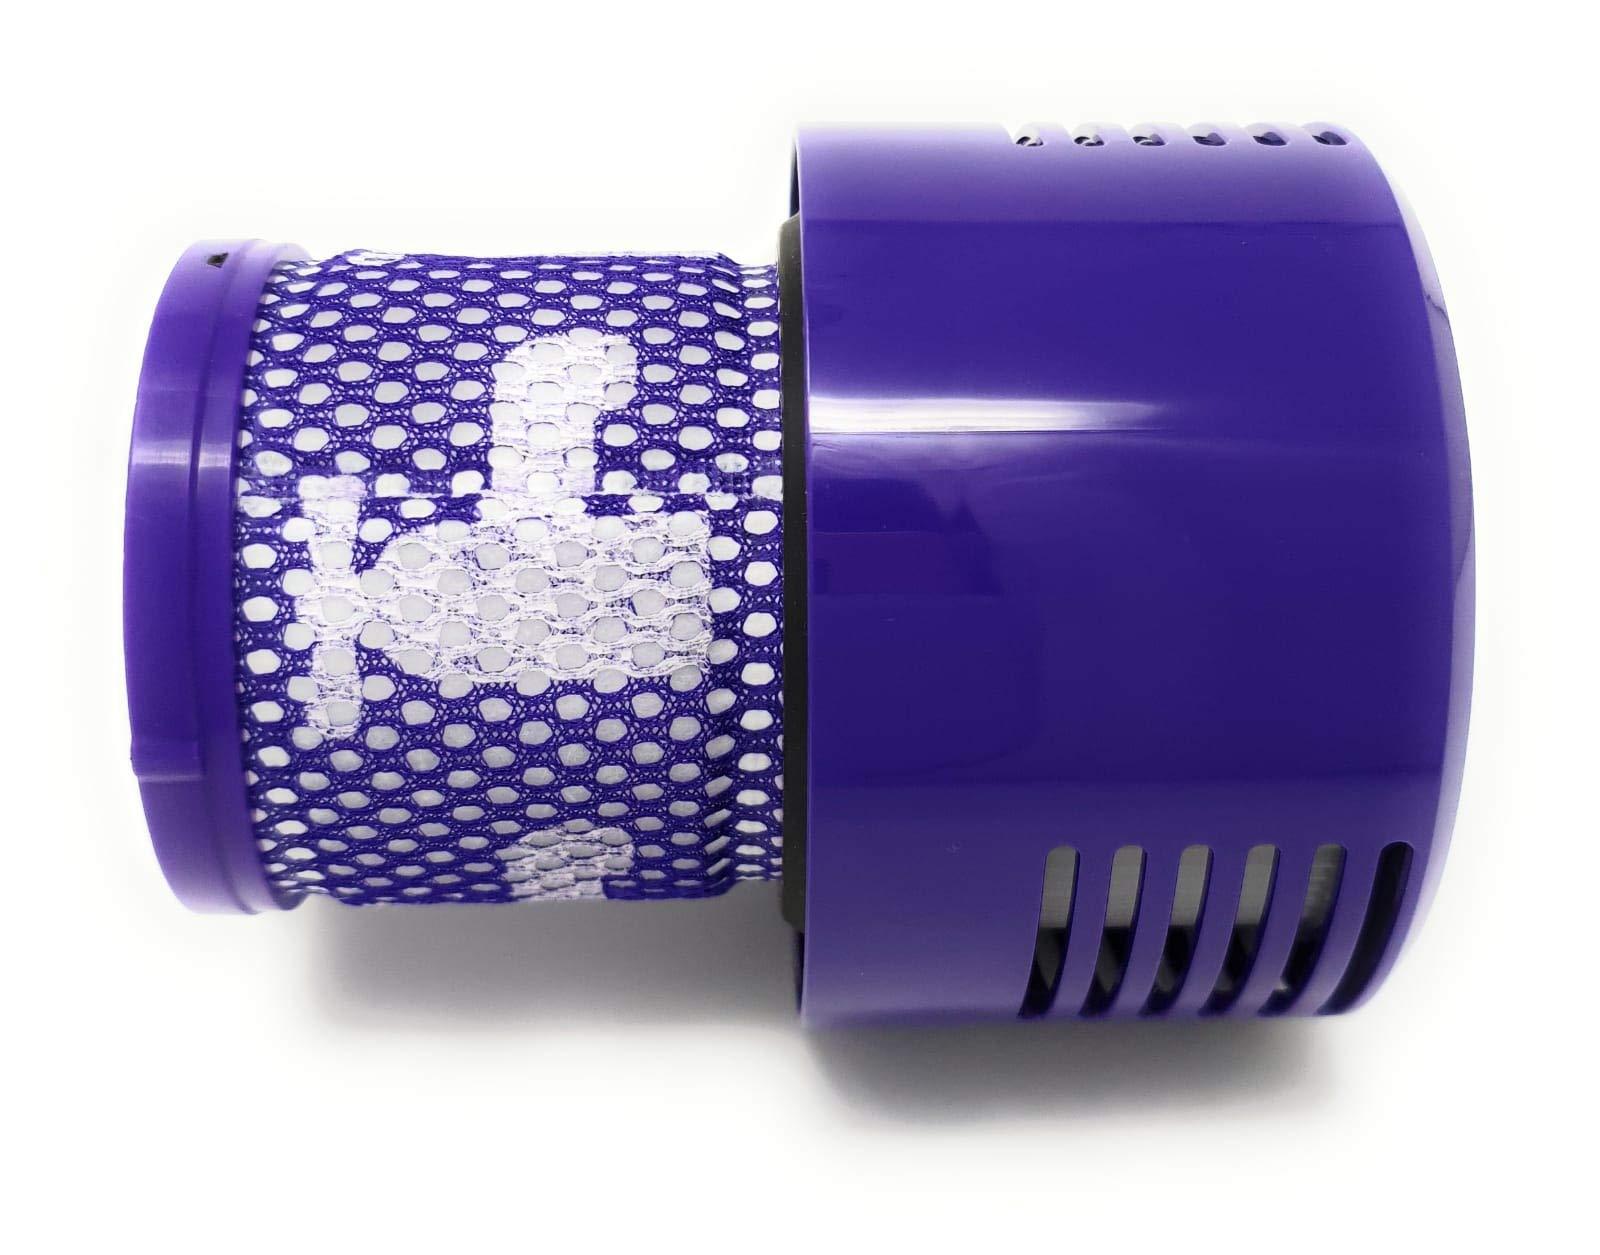 Dyson V10 SV12 kabelloser Staubsauger, waschbar, große Filtereinheit